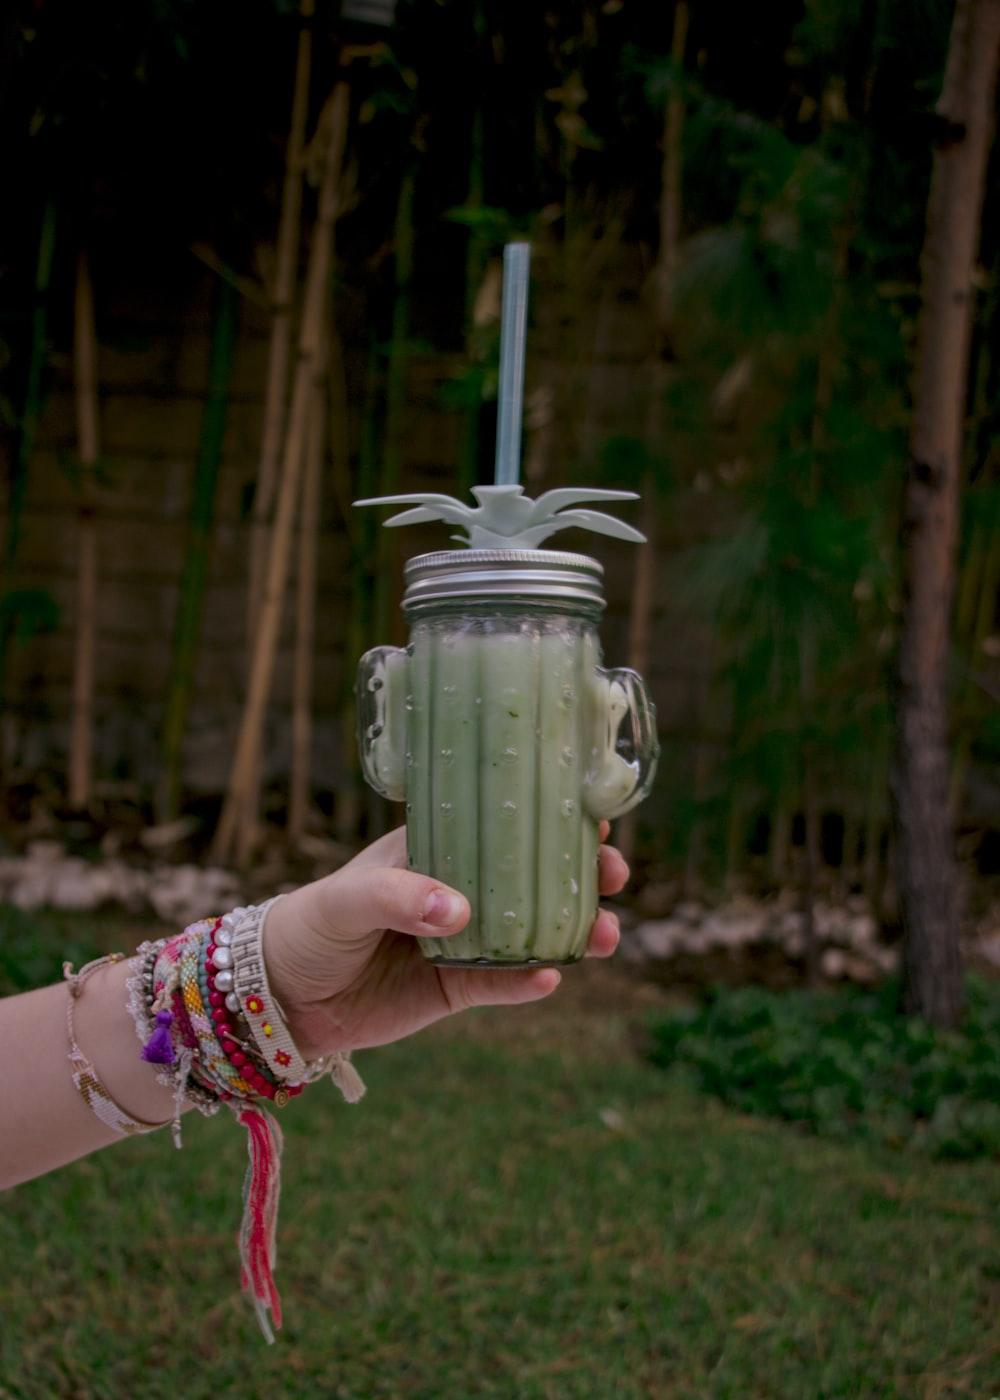 person holding green ceramic jar